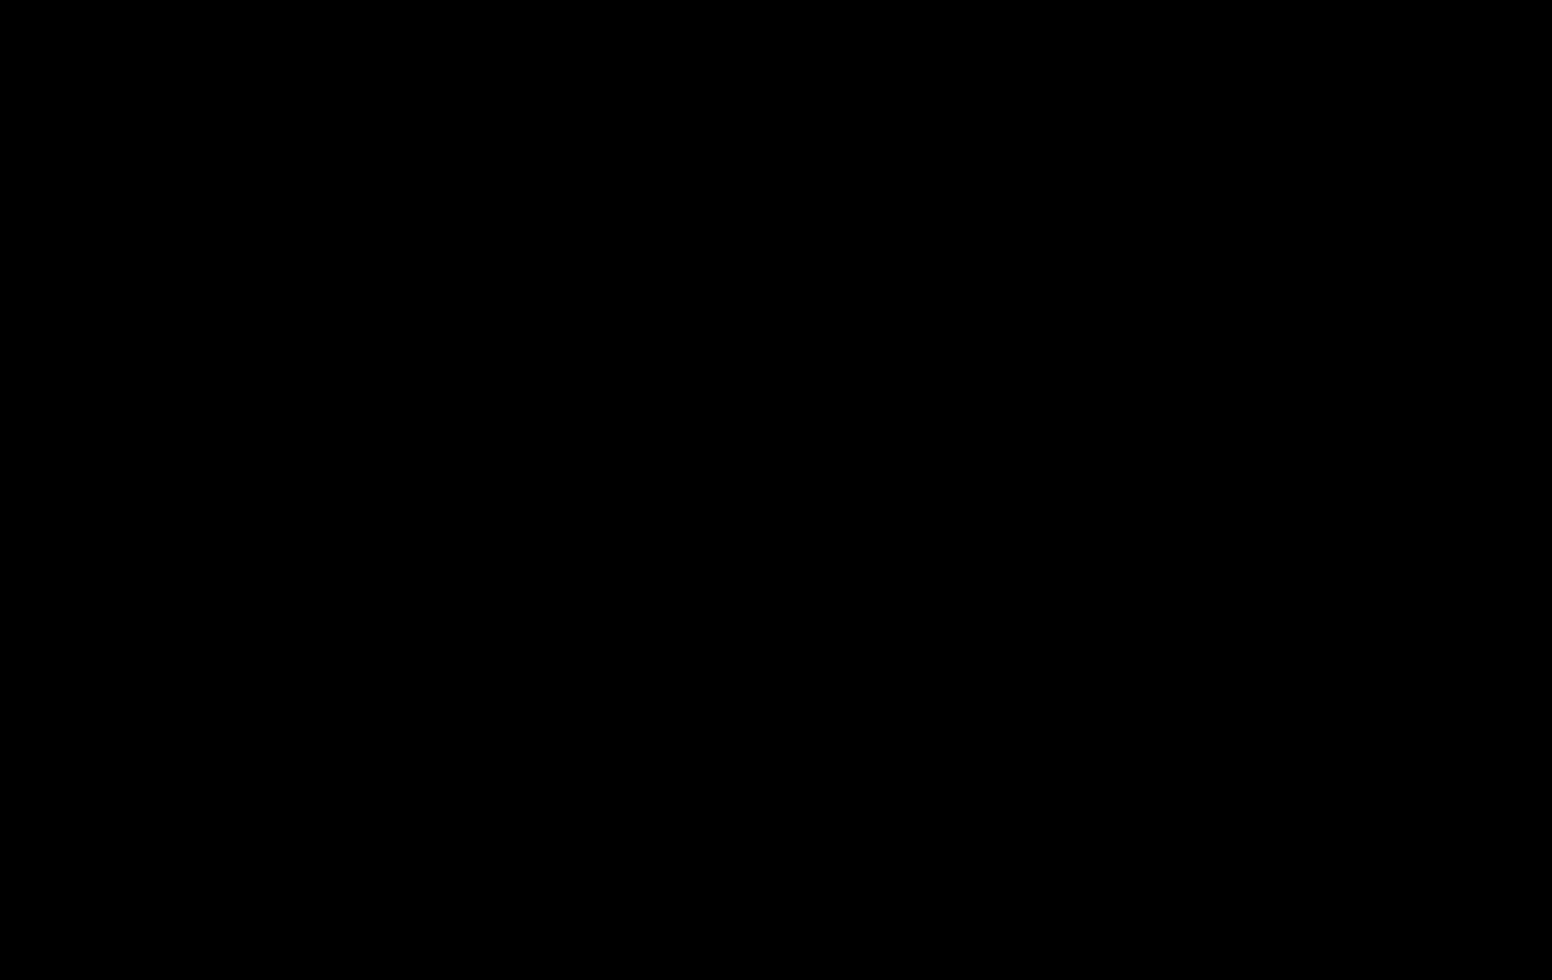 Sternschnuppe png